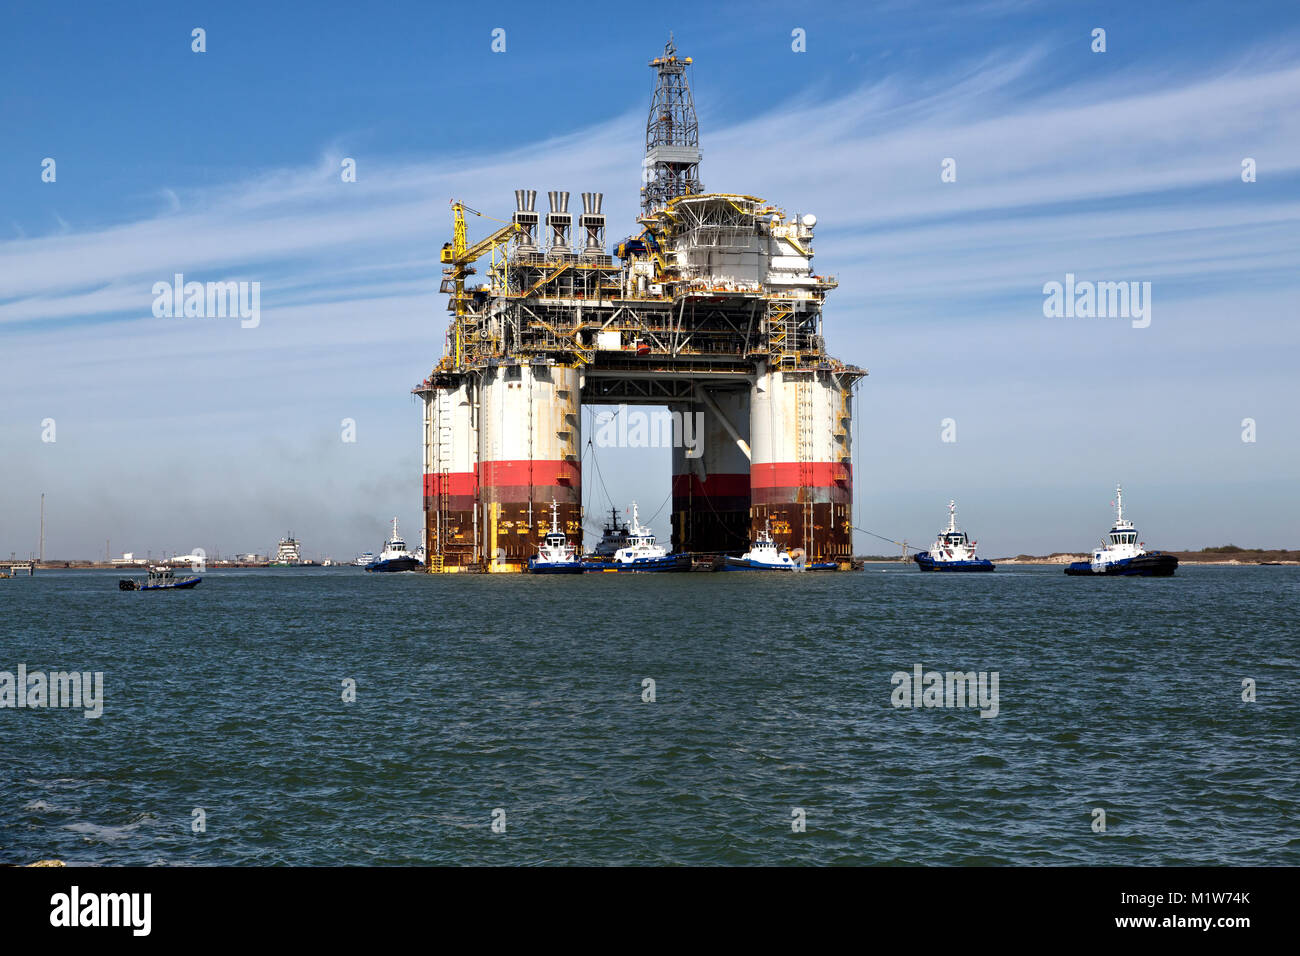 'Big Foot'  Chevron's Offshore Deep Ocean Platform, oil & natural gas platform drill rig. - Stock Image